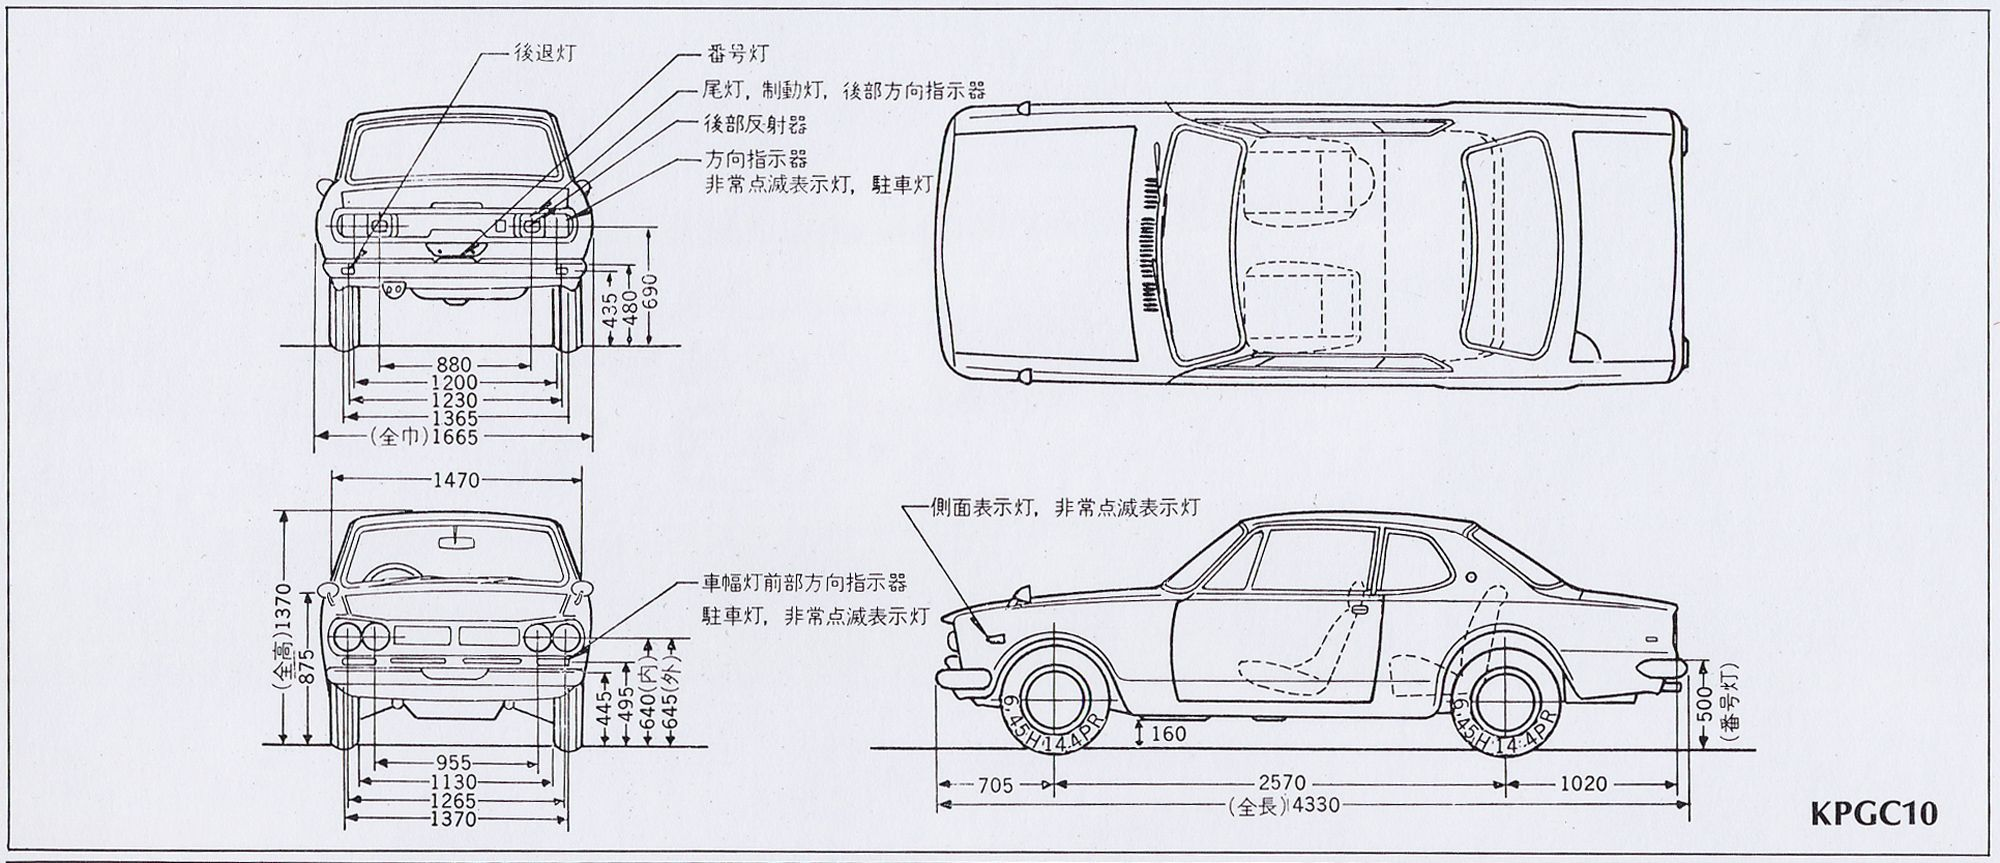 hight resolution of dimension kpgc hakosuka nissan skyline 2000 skyline gtr jdm cars automobile